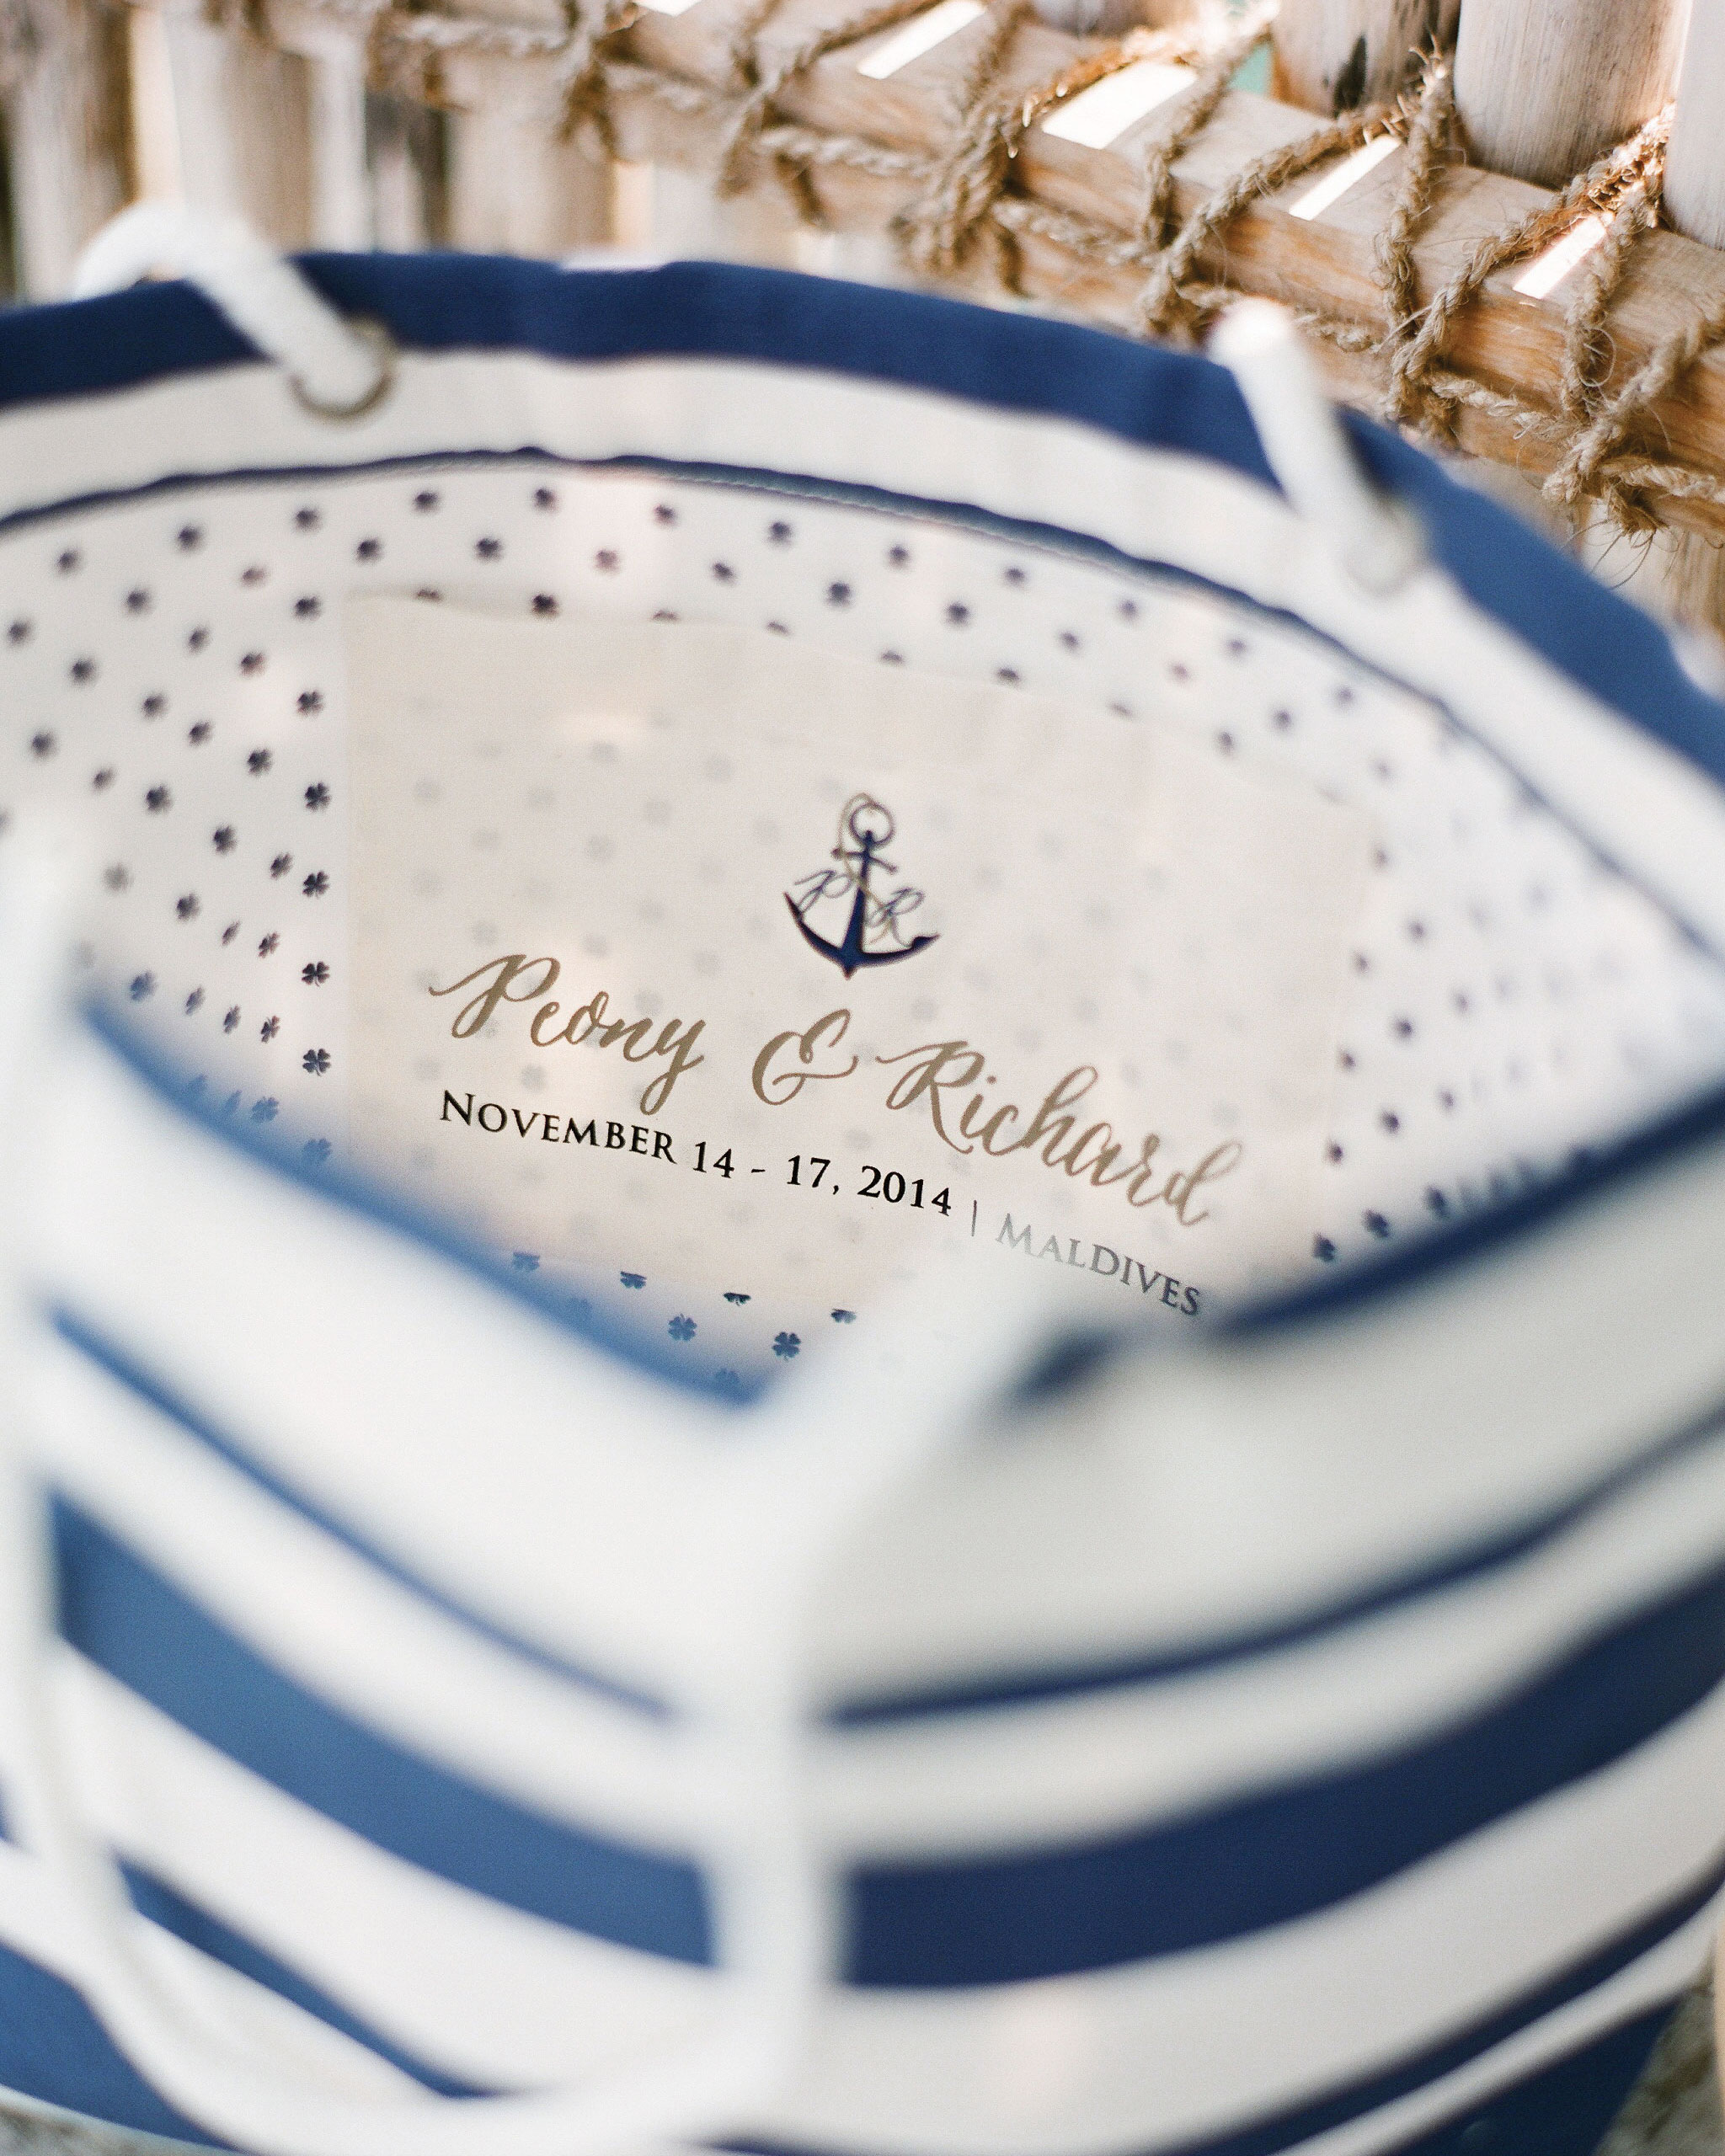 peony-richard-wedding-maldives-welcome-bag-0859-s112383.jpg